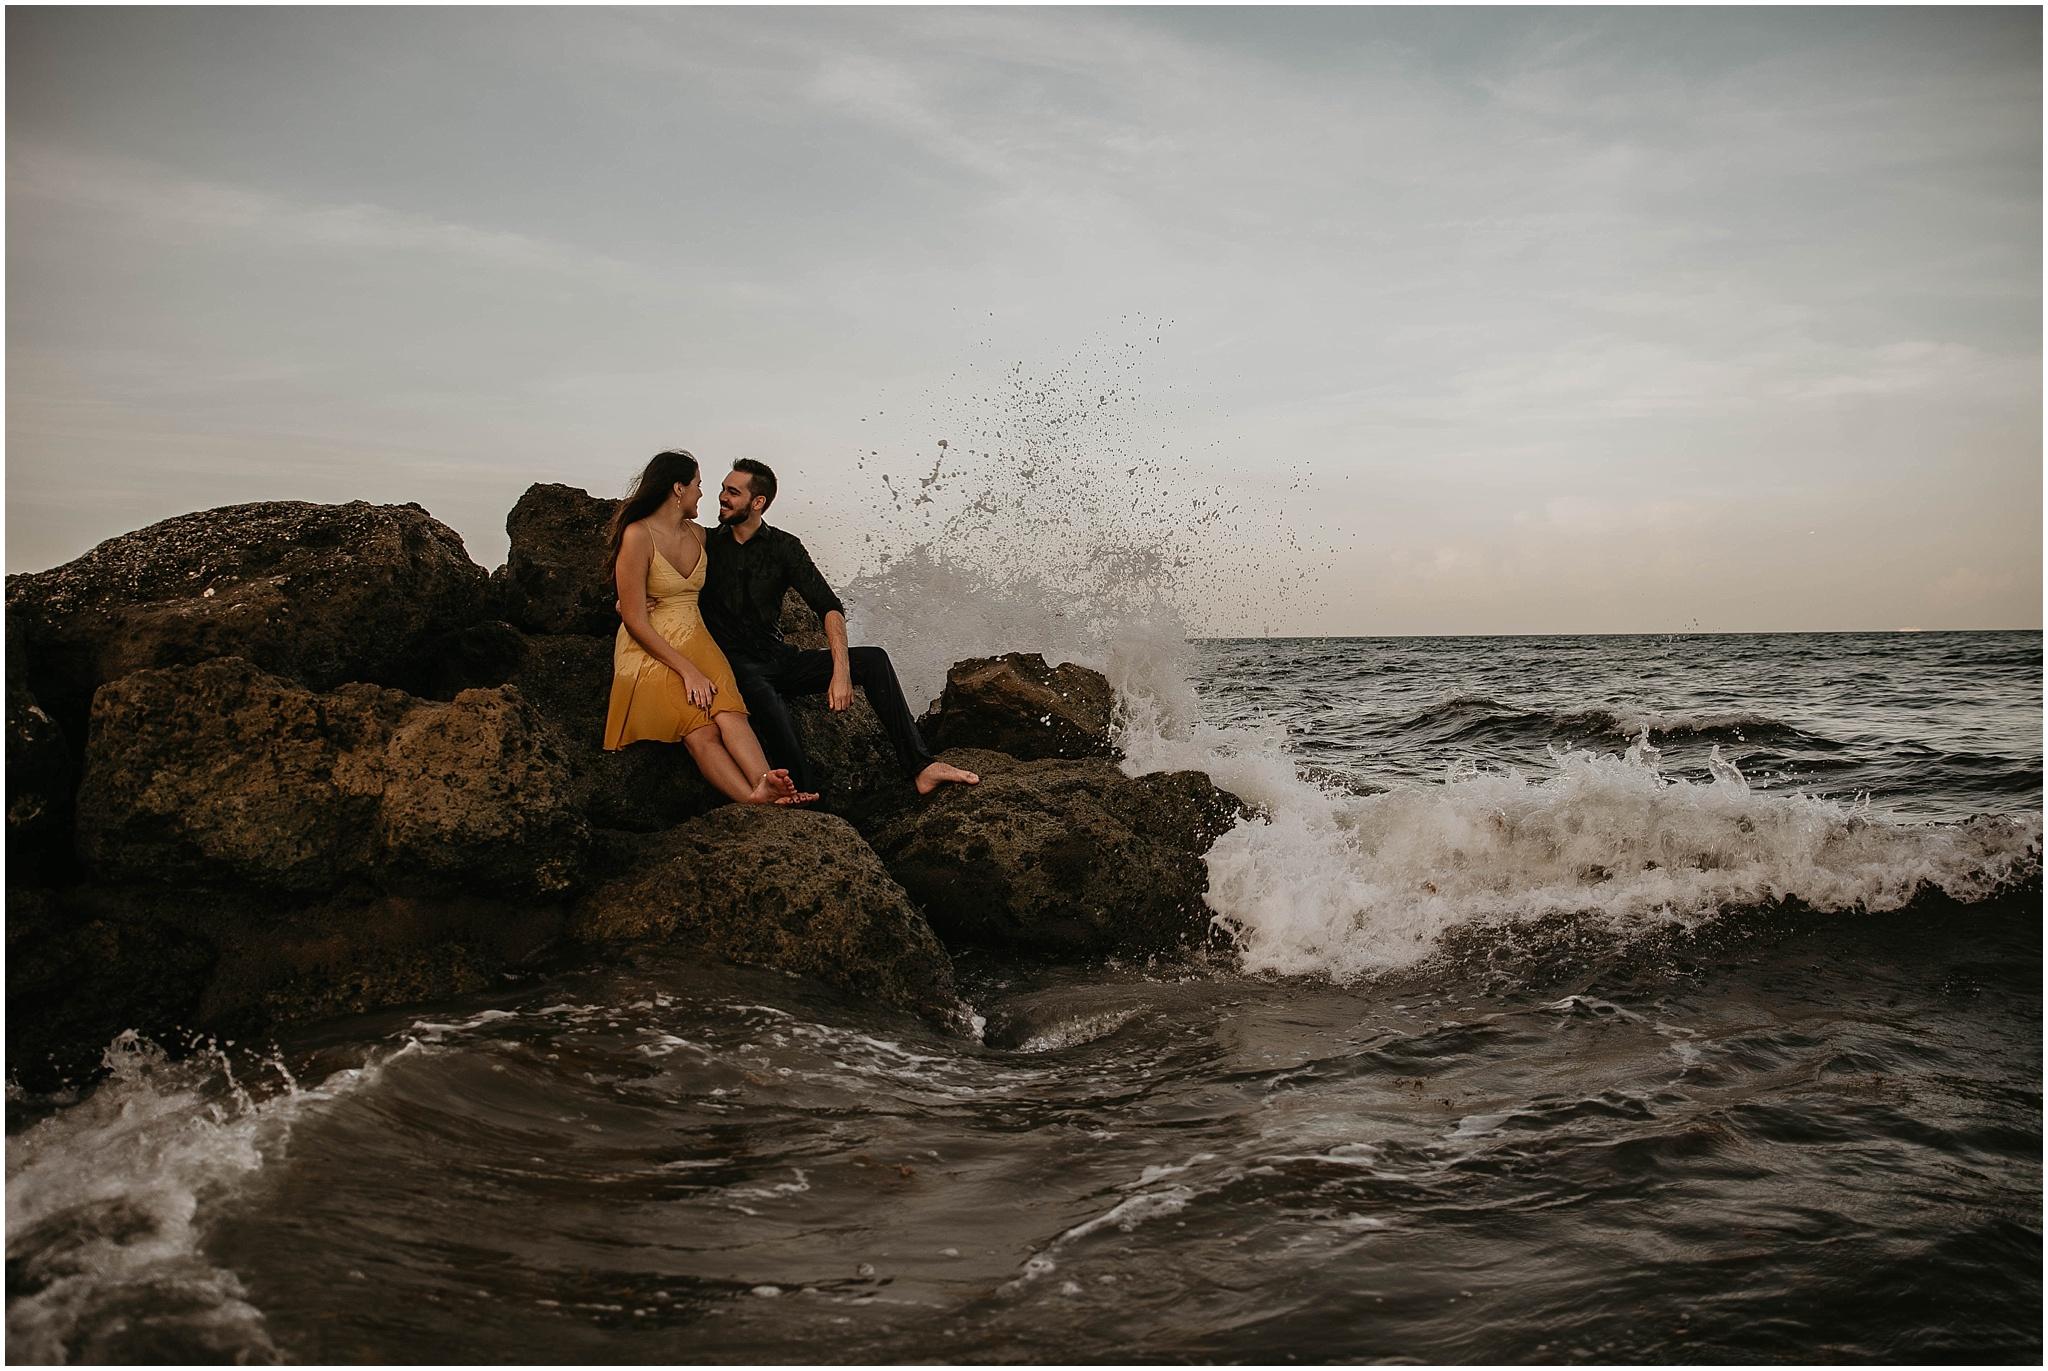 Worth-Avenue-Palm-Beach-engagement-photographer_0022.jpg